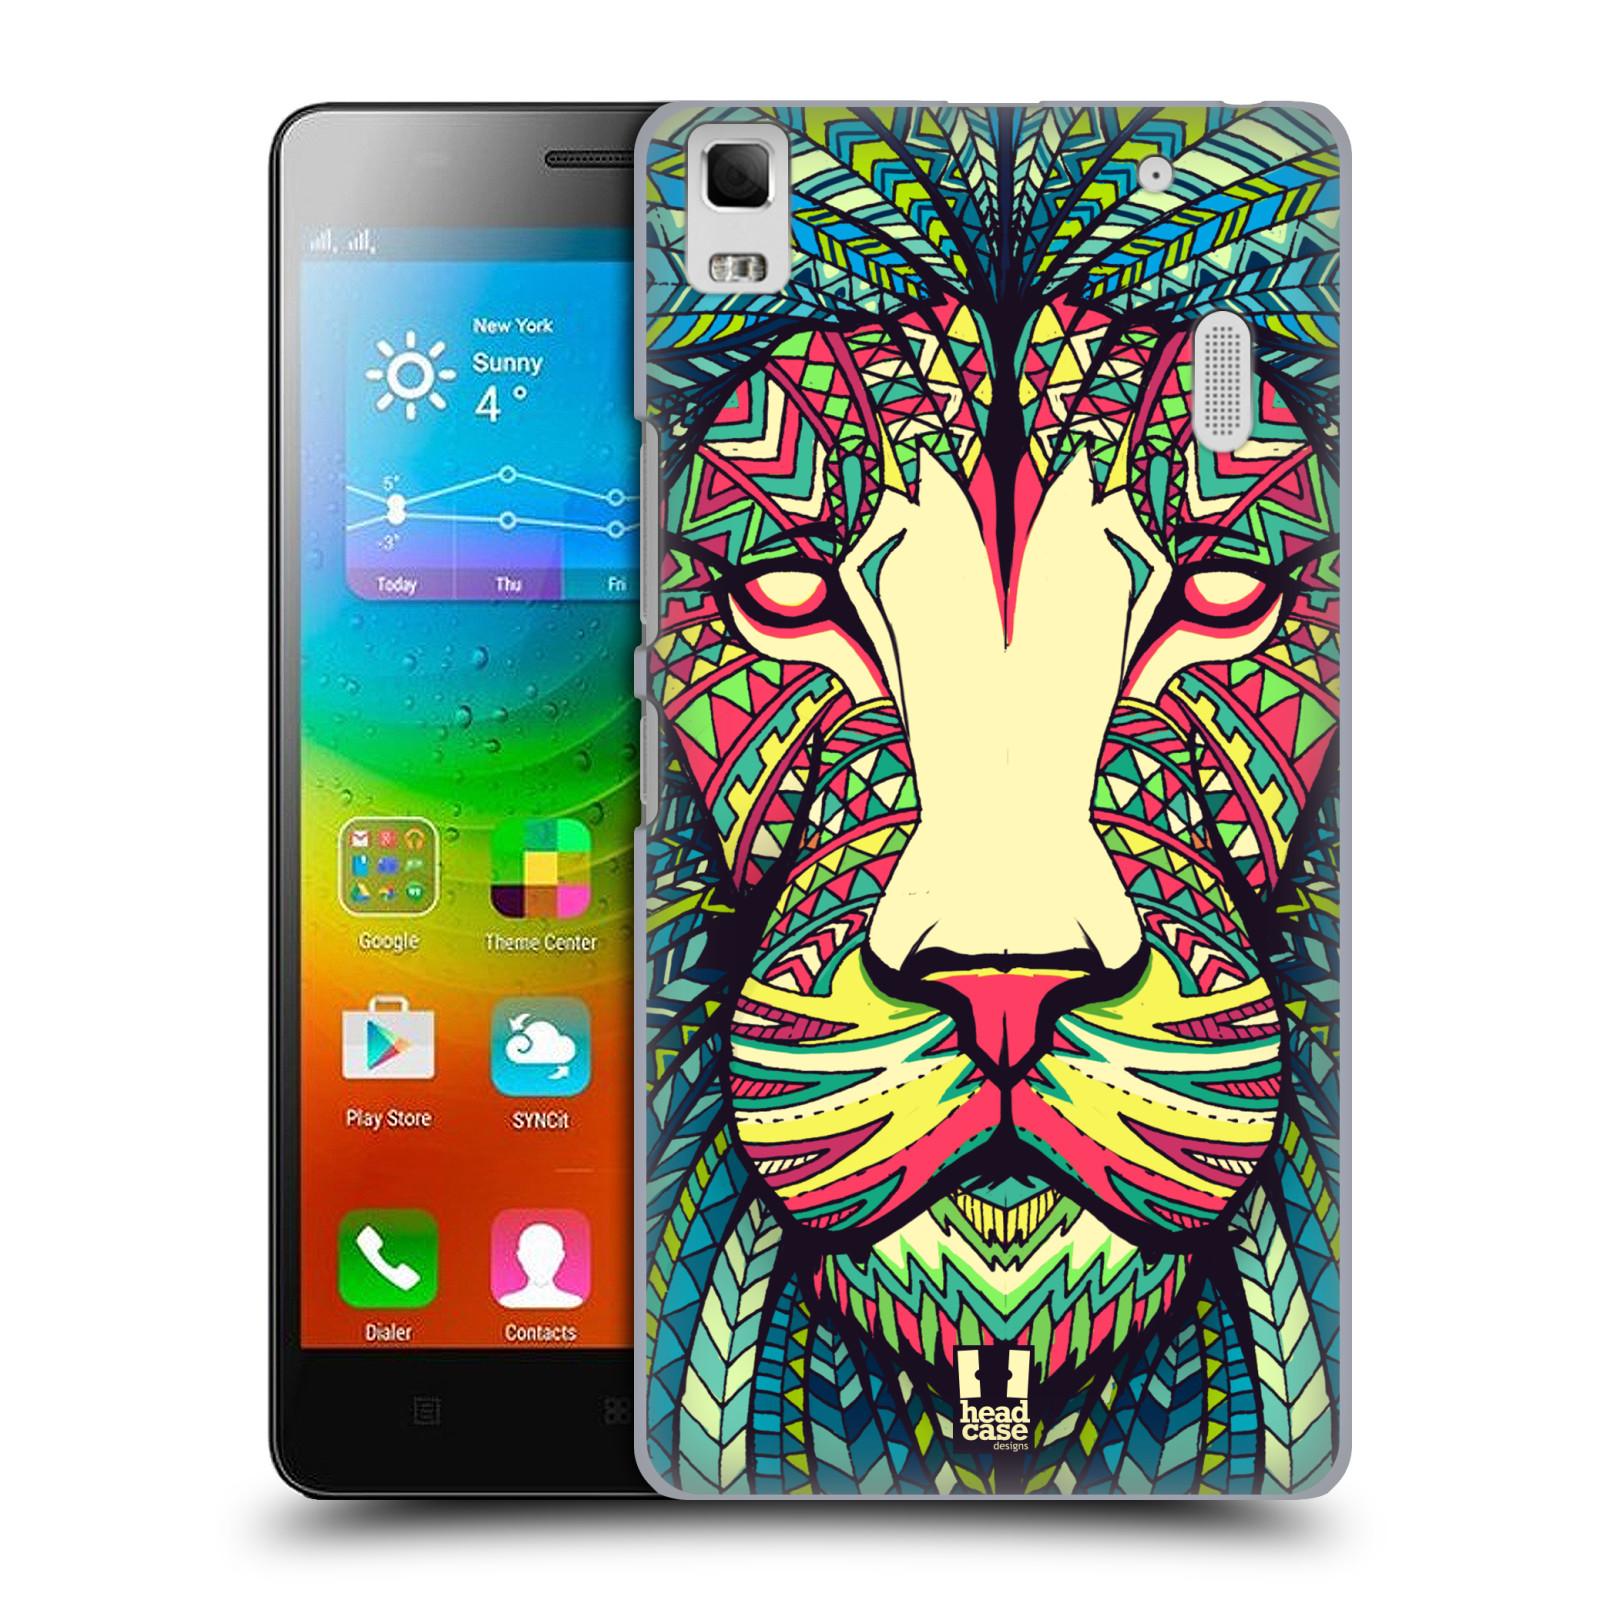 HEAD CASE pevný plastový obal na mobil LENOVO A7000 / A7000 DUAL / K3 NOTE vzor Aztécký motiv zvíře lev